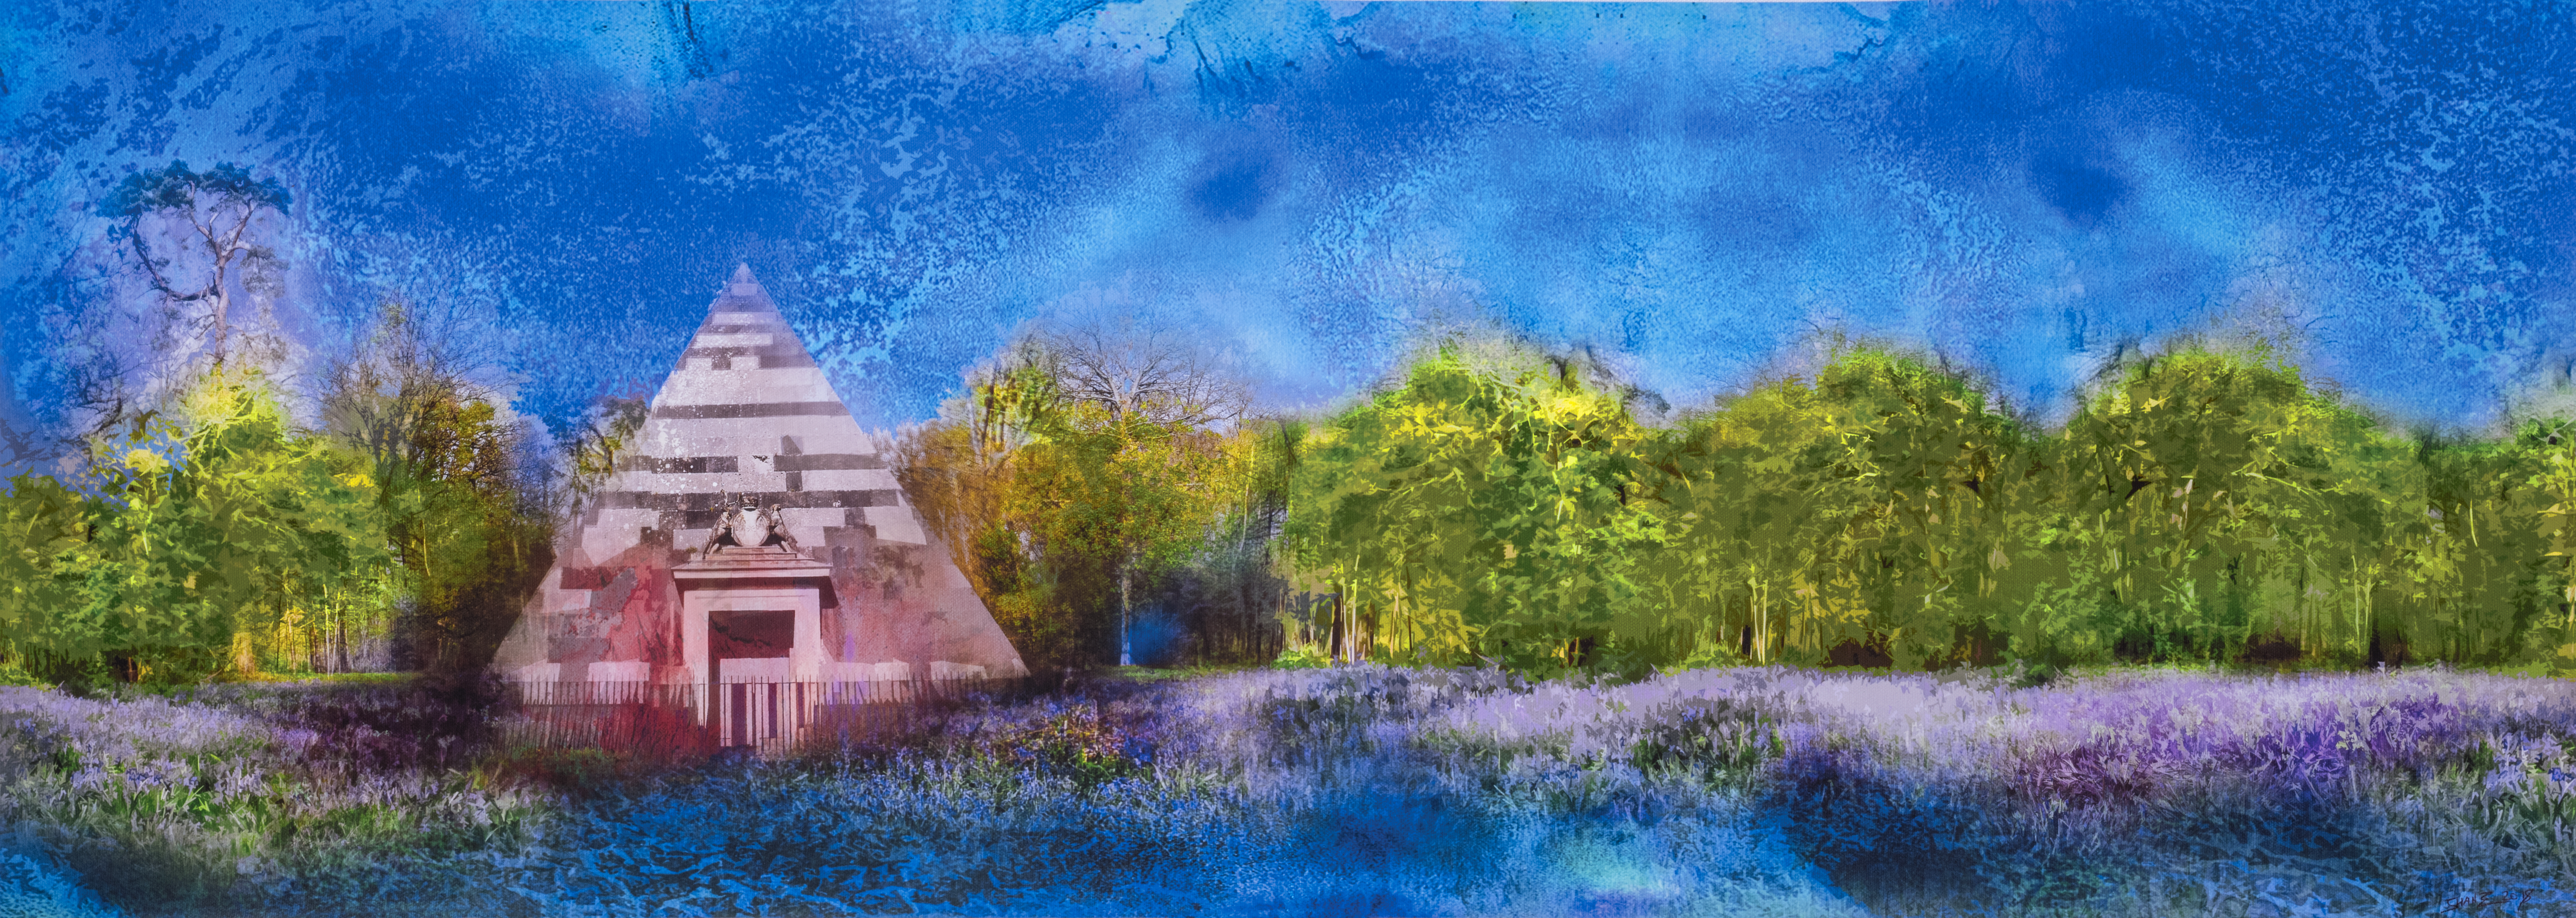 The Mausoleum at Blickling